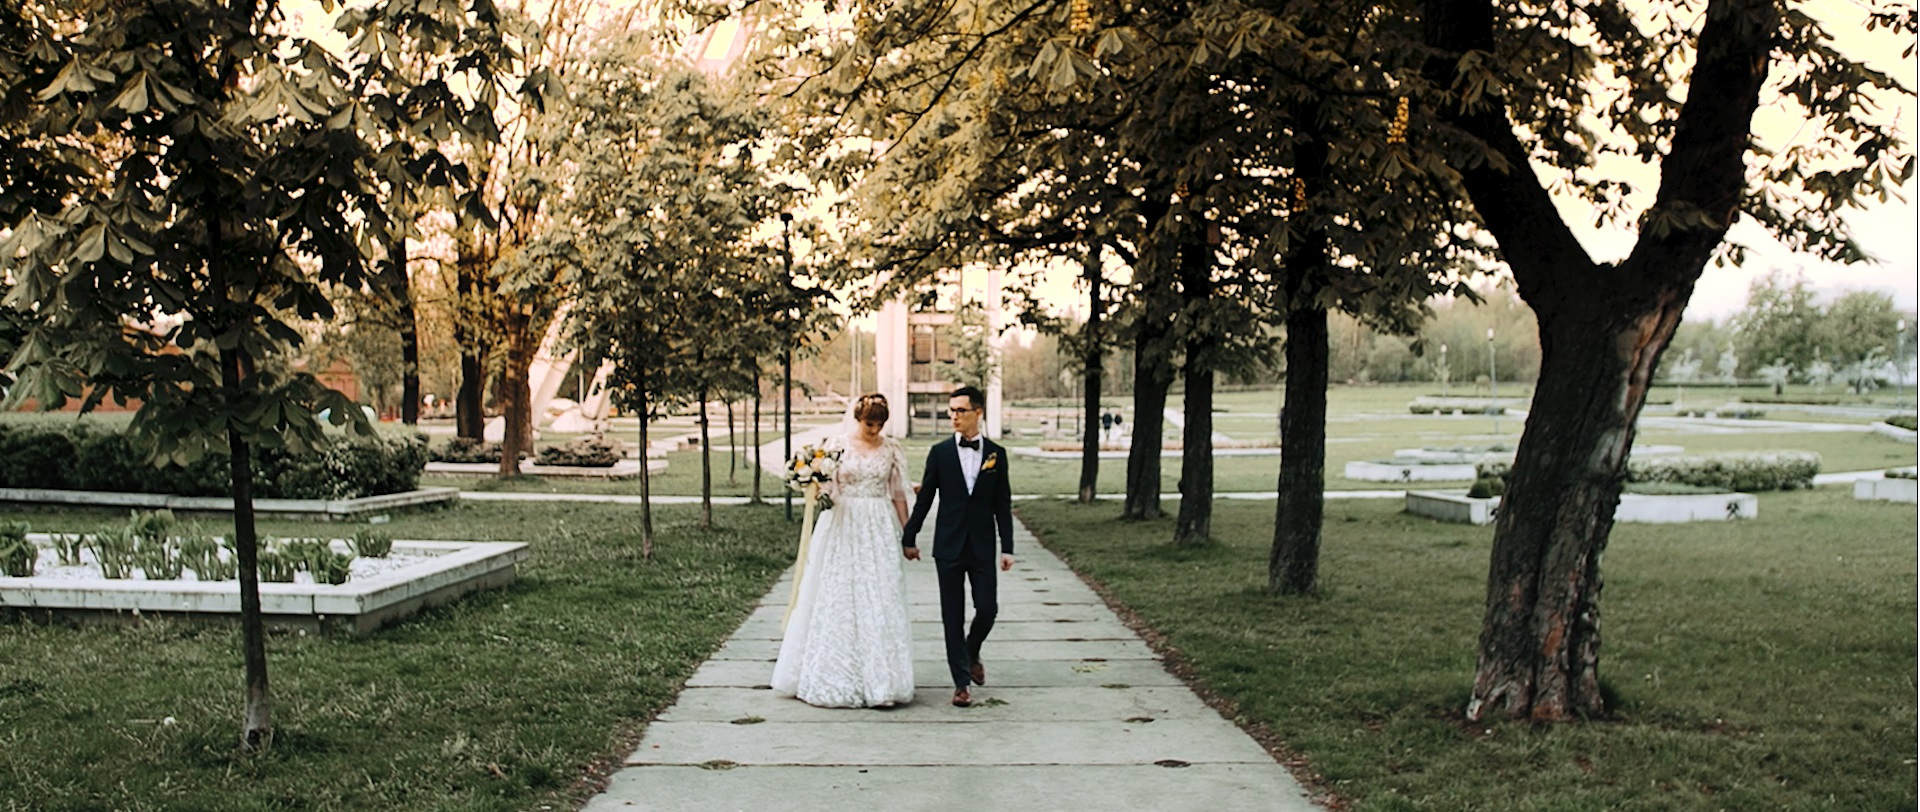 plener ślub wesele śląsk plenerowy katowice lovelyfilm lovely film wedding video